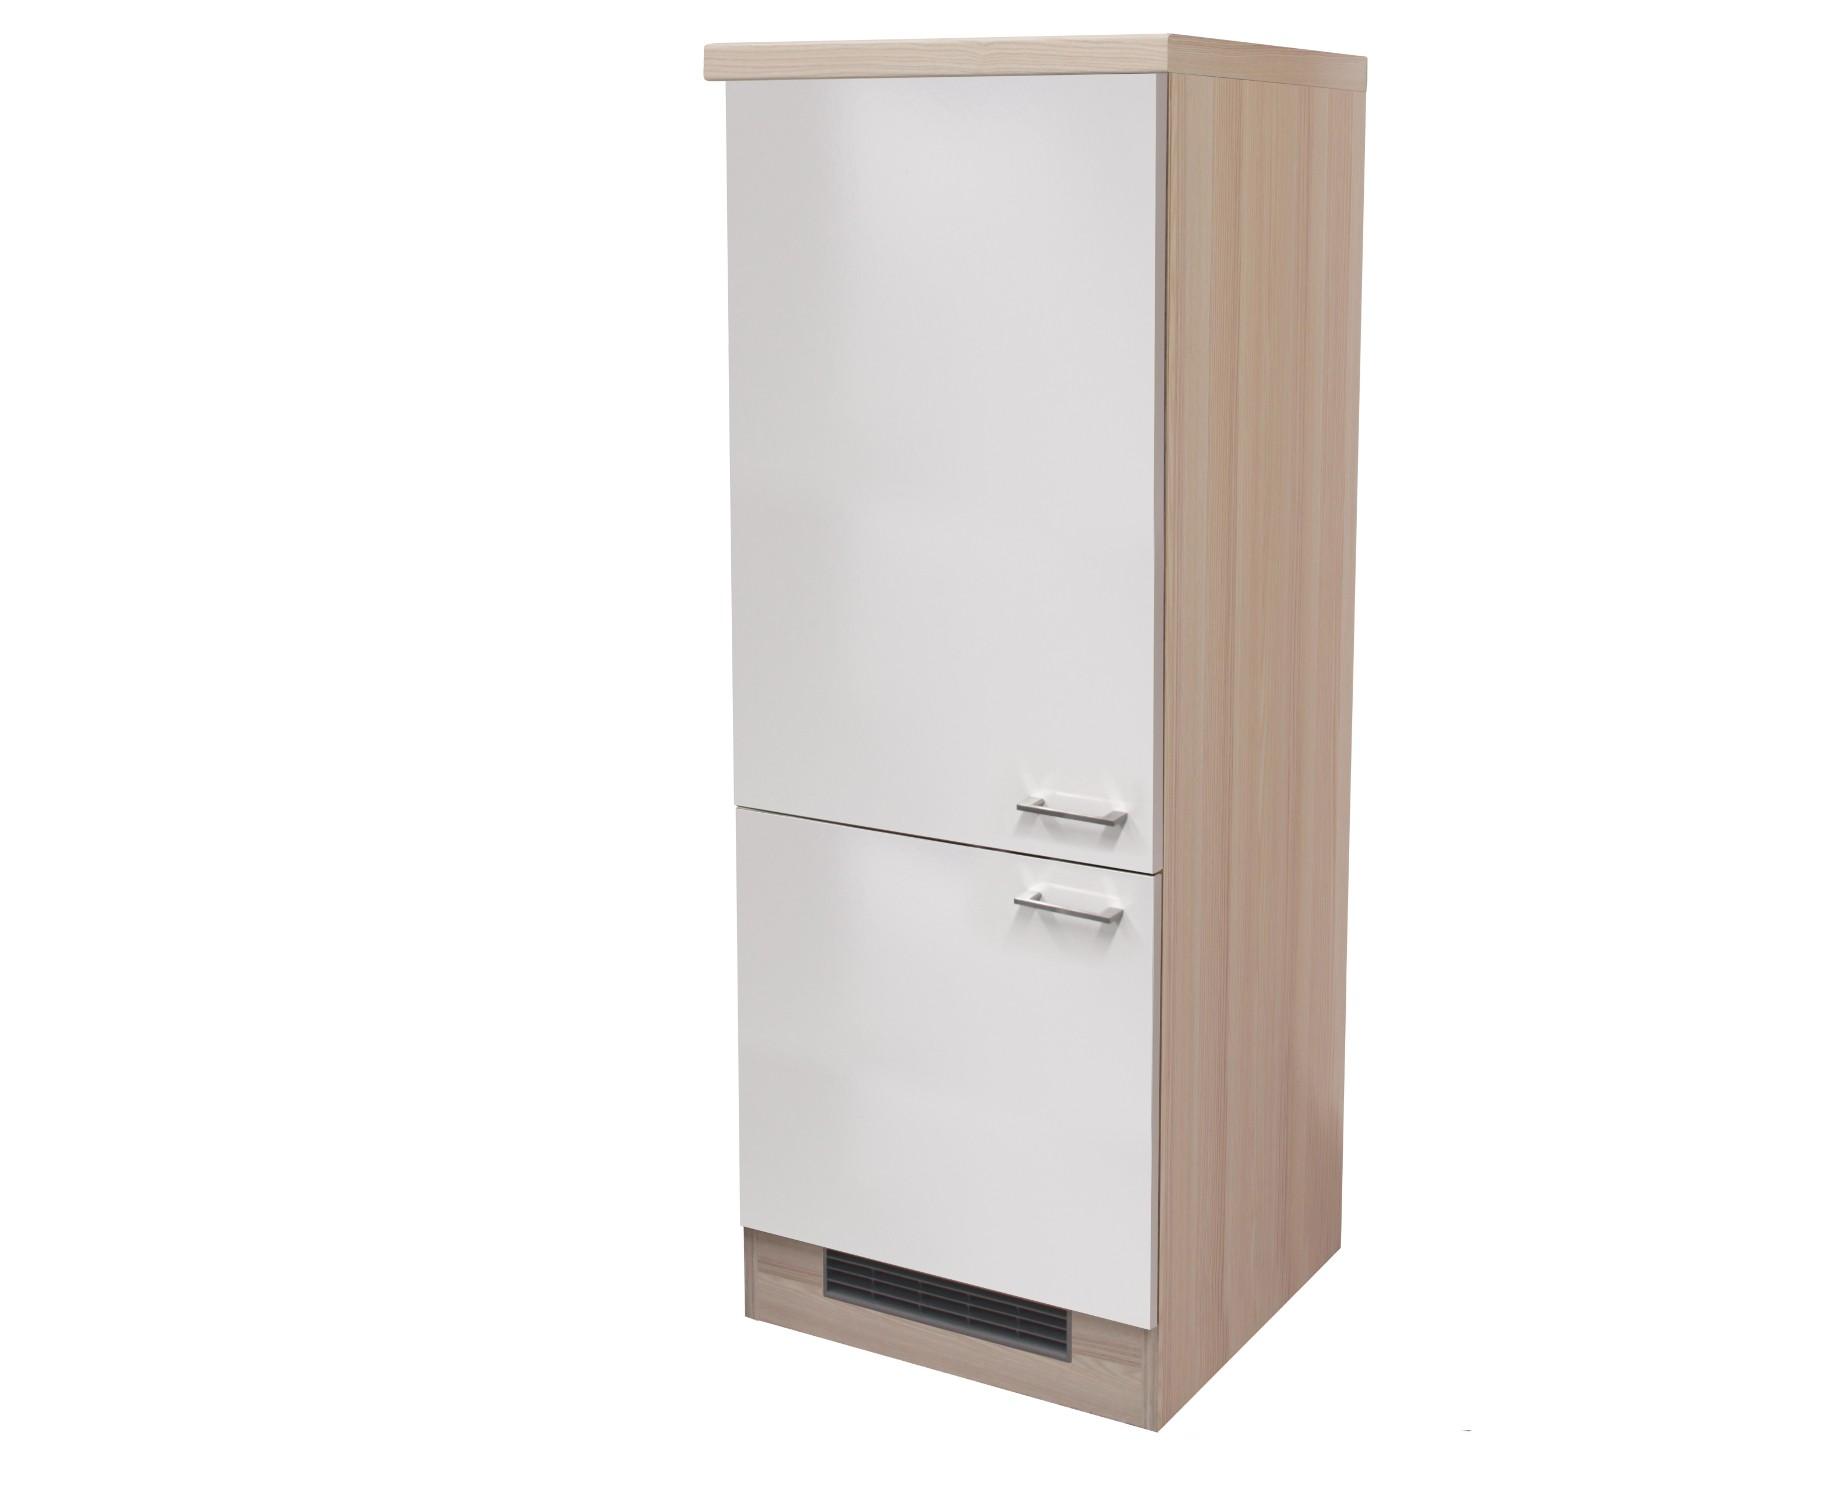 Kühlschrank Pkm : Kühlschrankumbauschrank florenz incl einbau kühlschrank